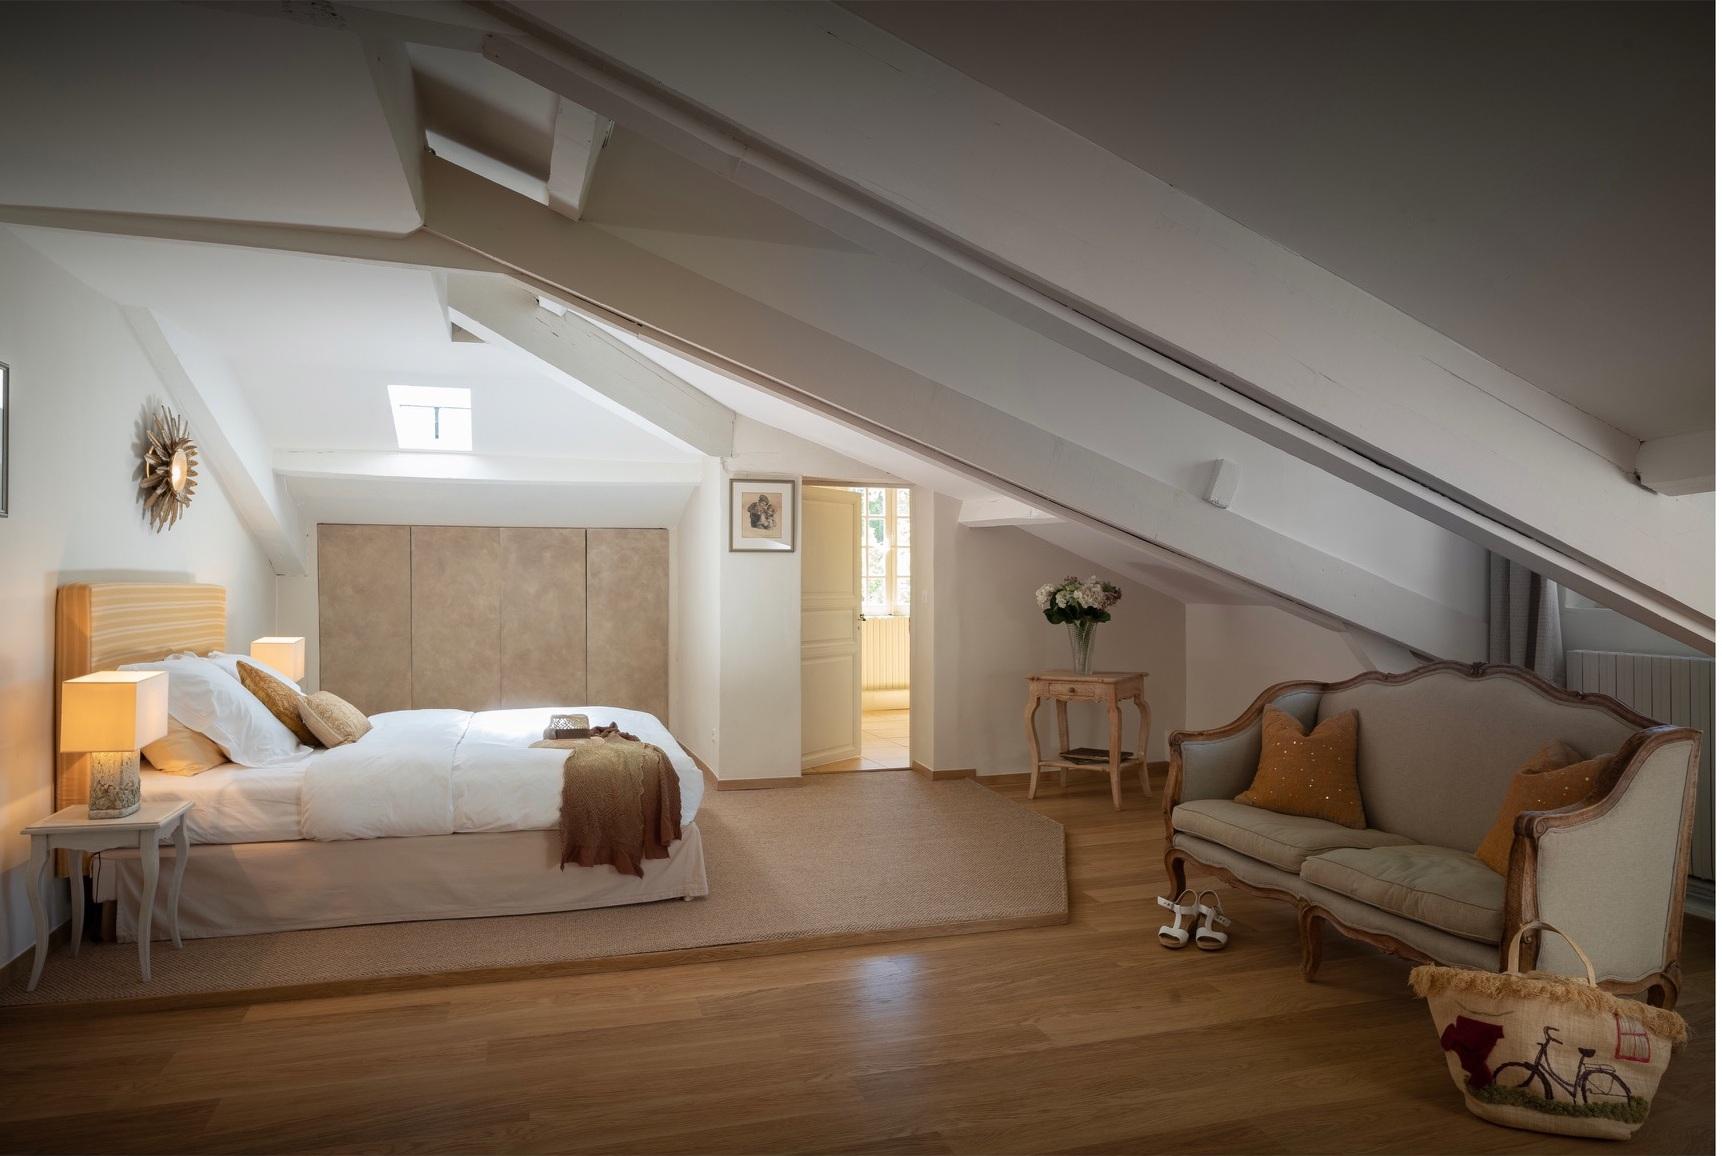 Beaumont, second floor bedroom with views of the parterre gardens